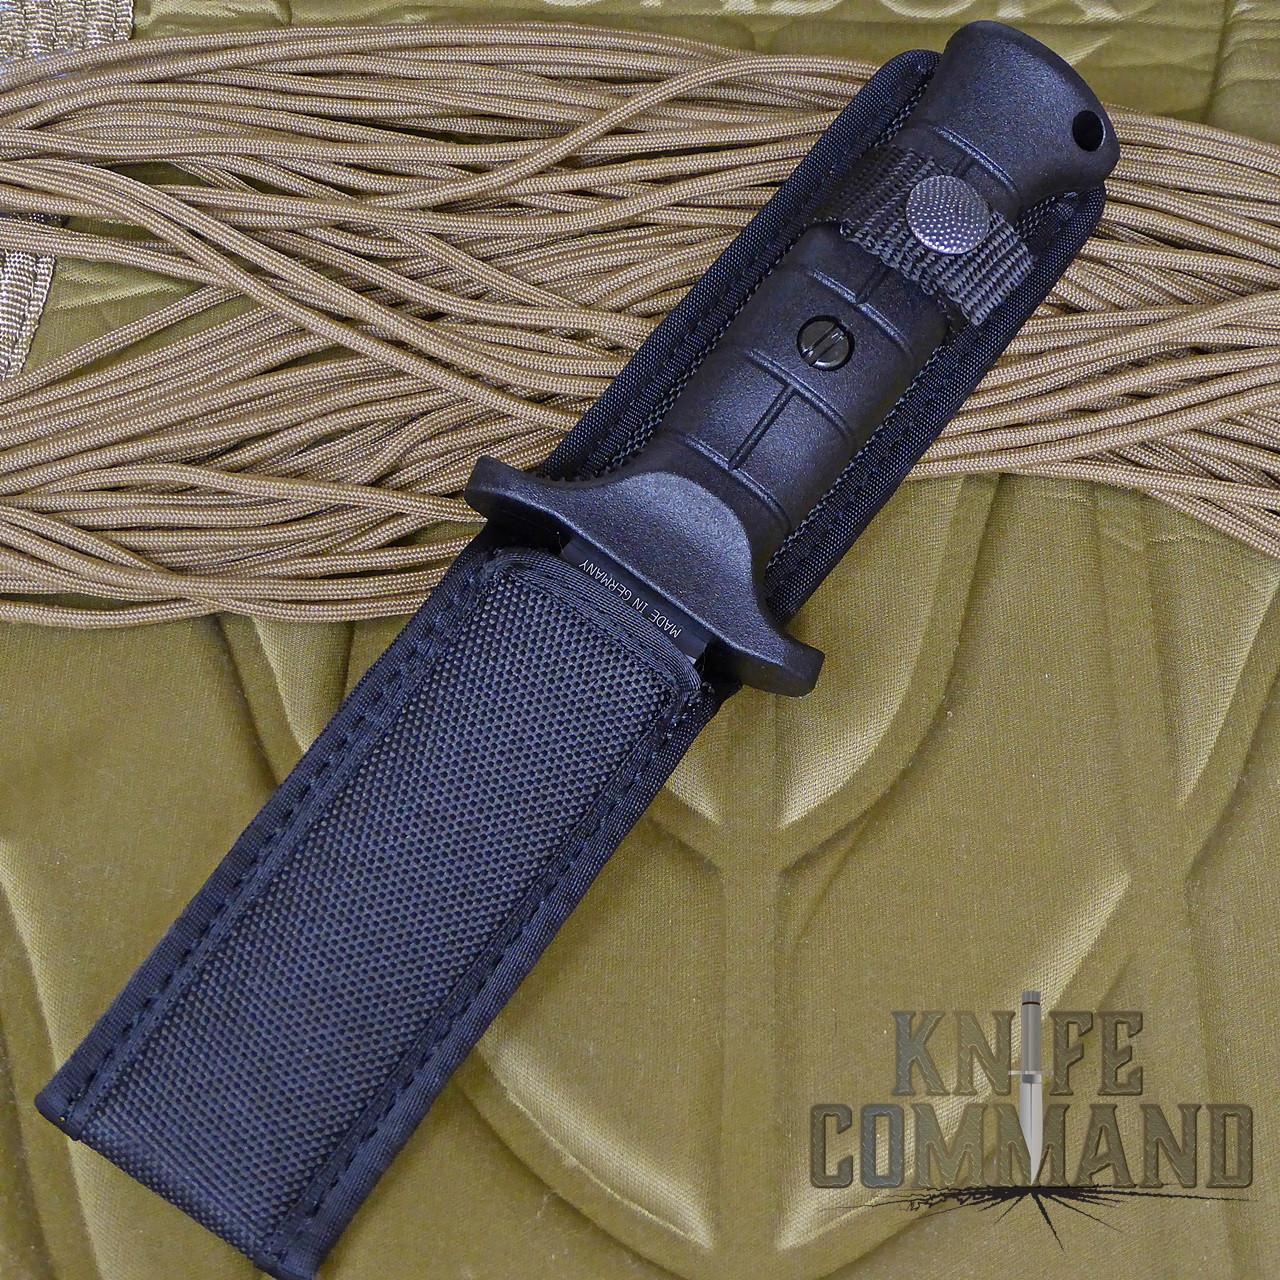 Eickhorn Solingen UK 2000 Lightweight Utility Combat Knife.  Molle compatible Cordura sheath.